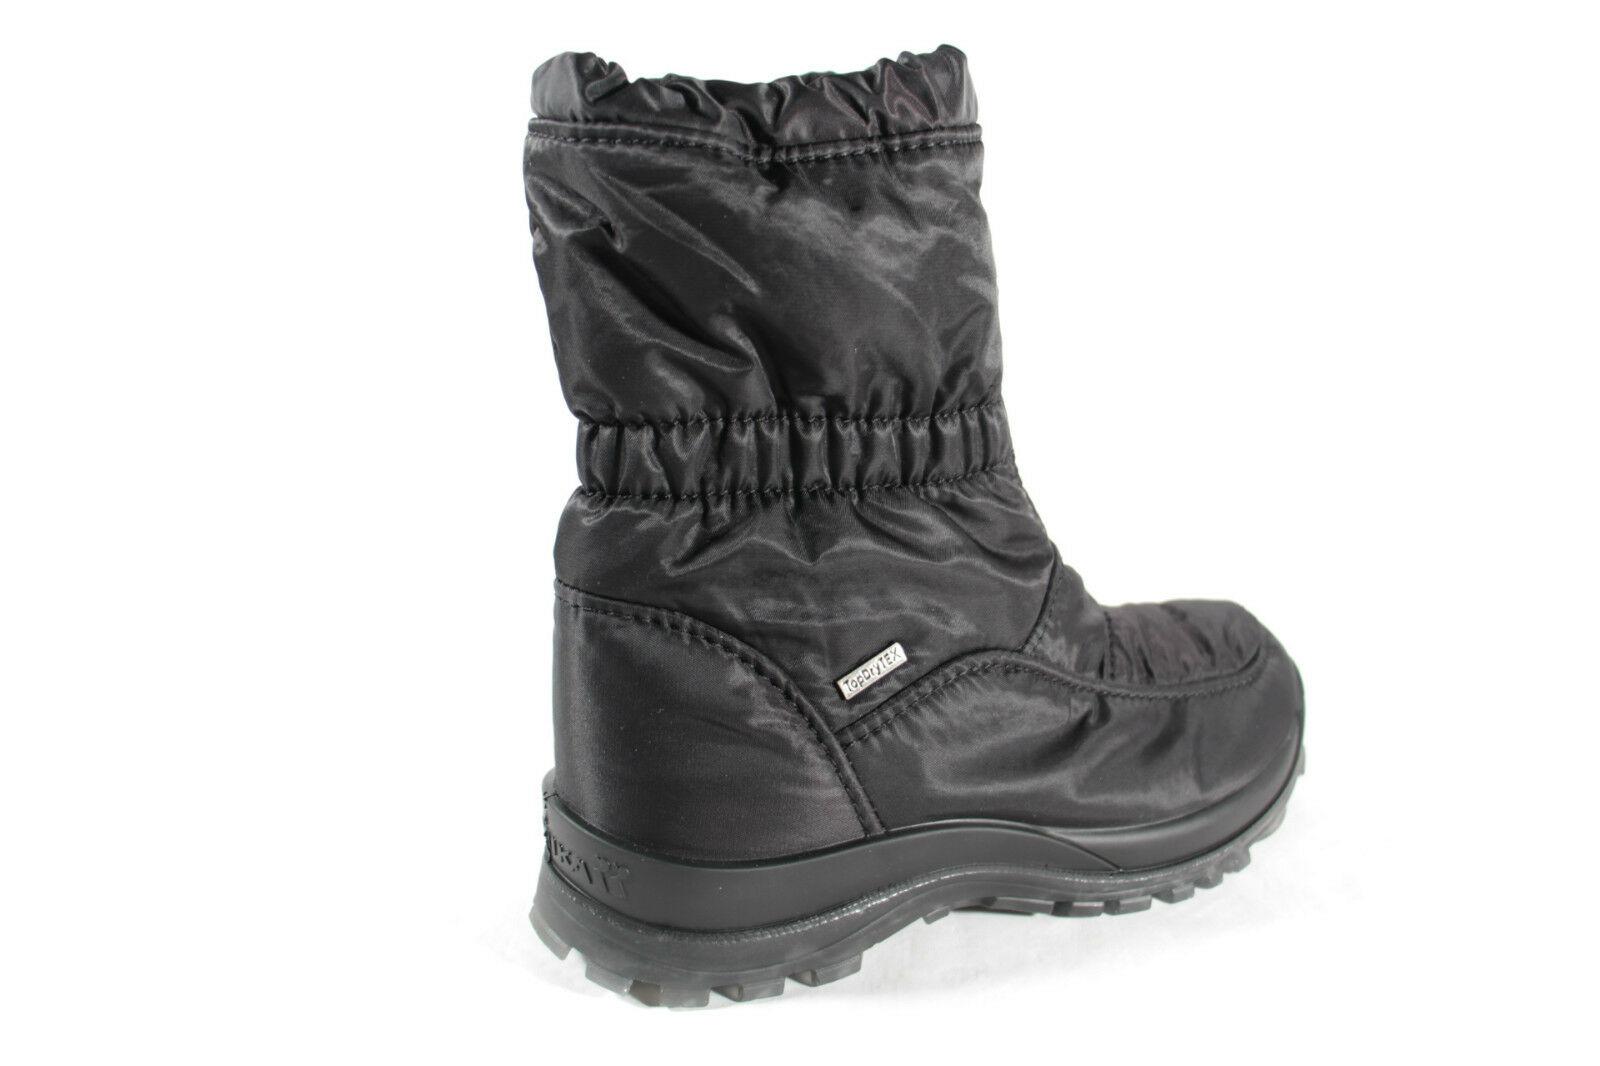 Romika Damen Stiefel Stiefel 87018 Winterstiefel schwarz, wasserdicht wasserdicht wasserdicht NEU   d59d30